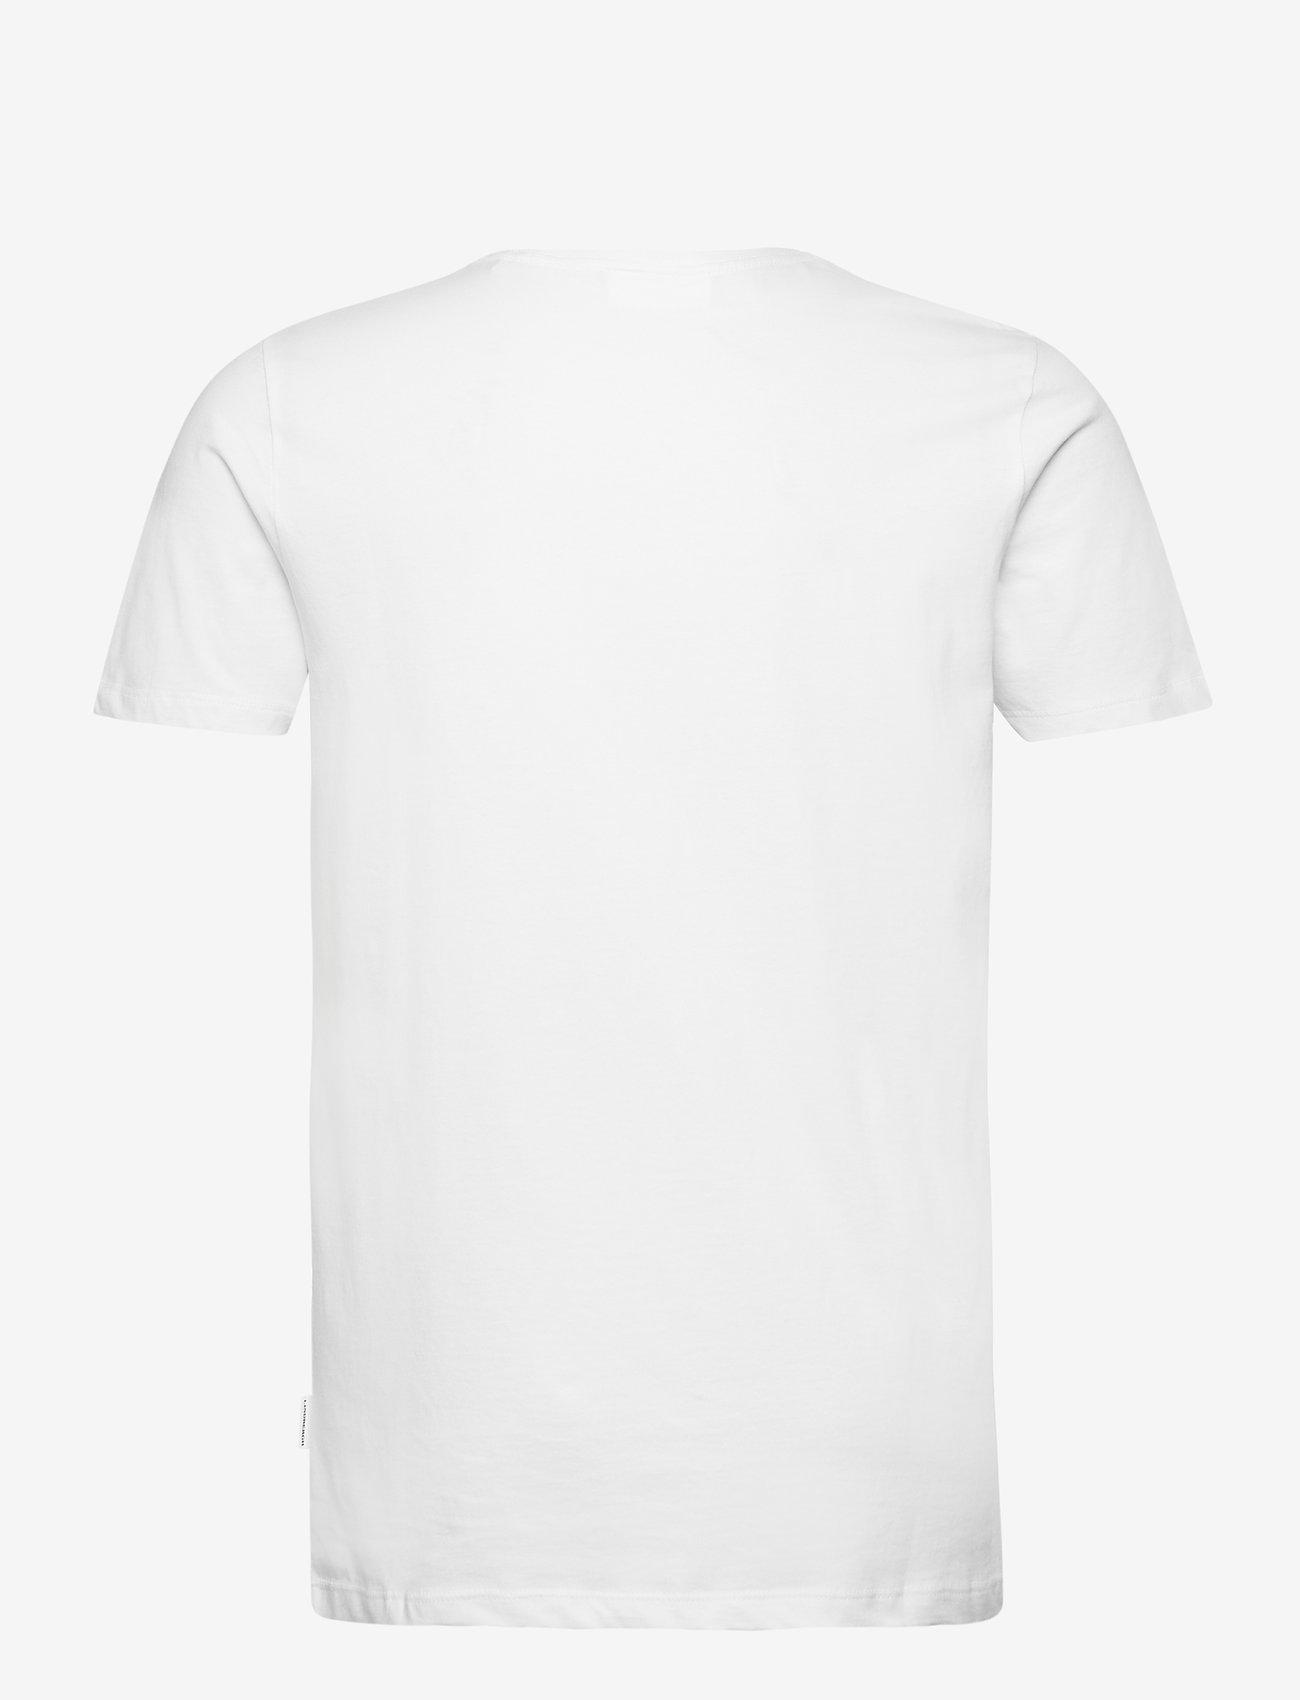 Lindbergh - Basic tee S/S - multipack - white - 1